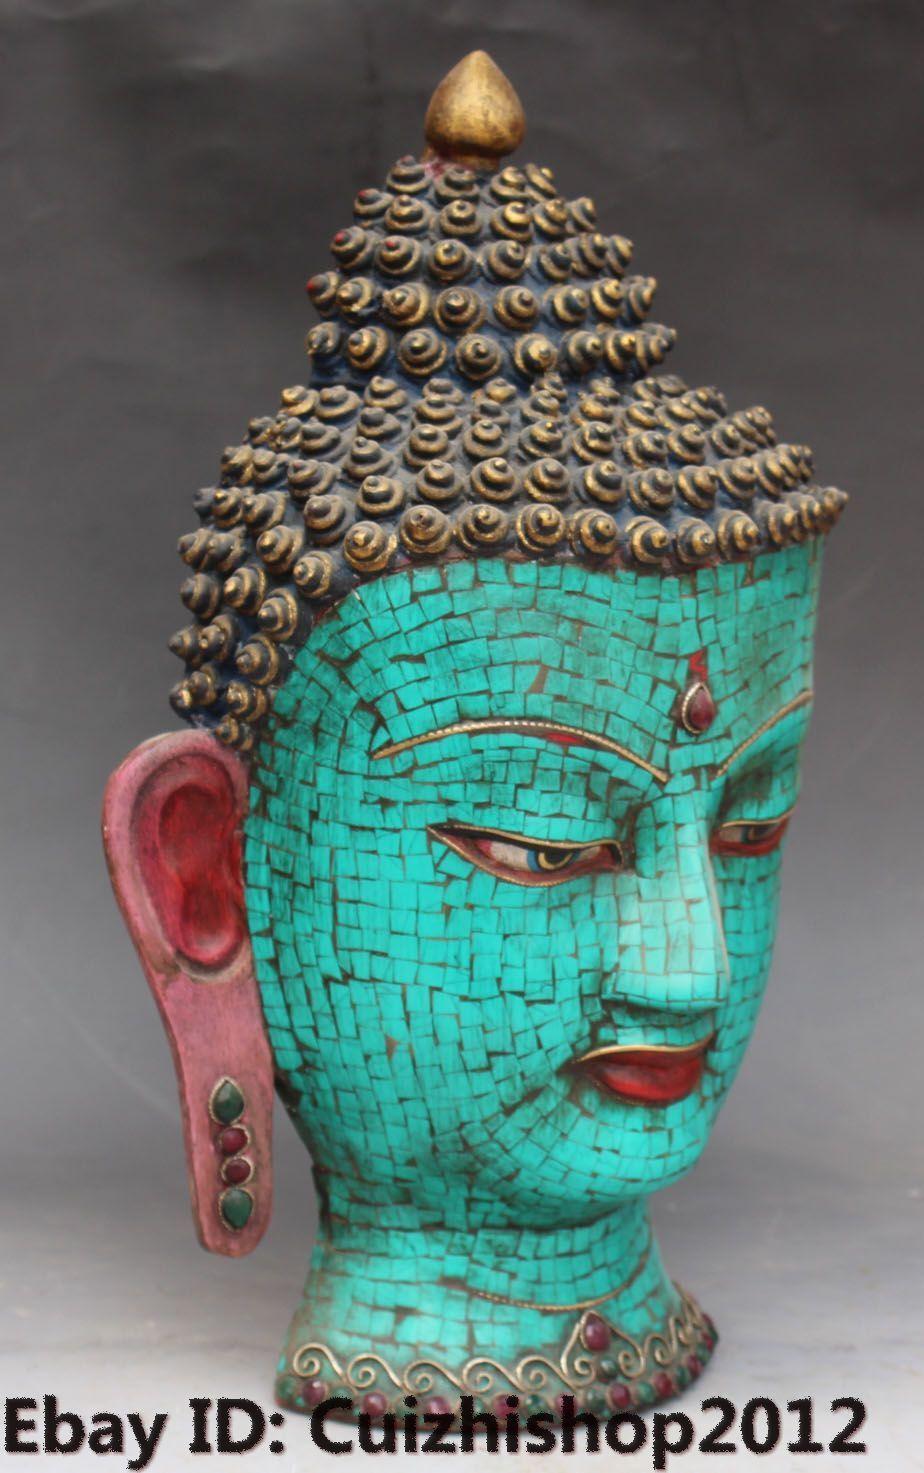 coral buddhist personals Yoga meditation peace consciousness spirituality wellness inner peace mindfulness buddhist meditation stress relief healthy living guided meditation insight meditation theravada buddhism vipassana meditation.